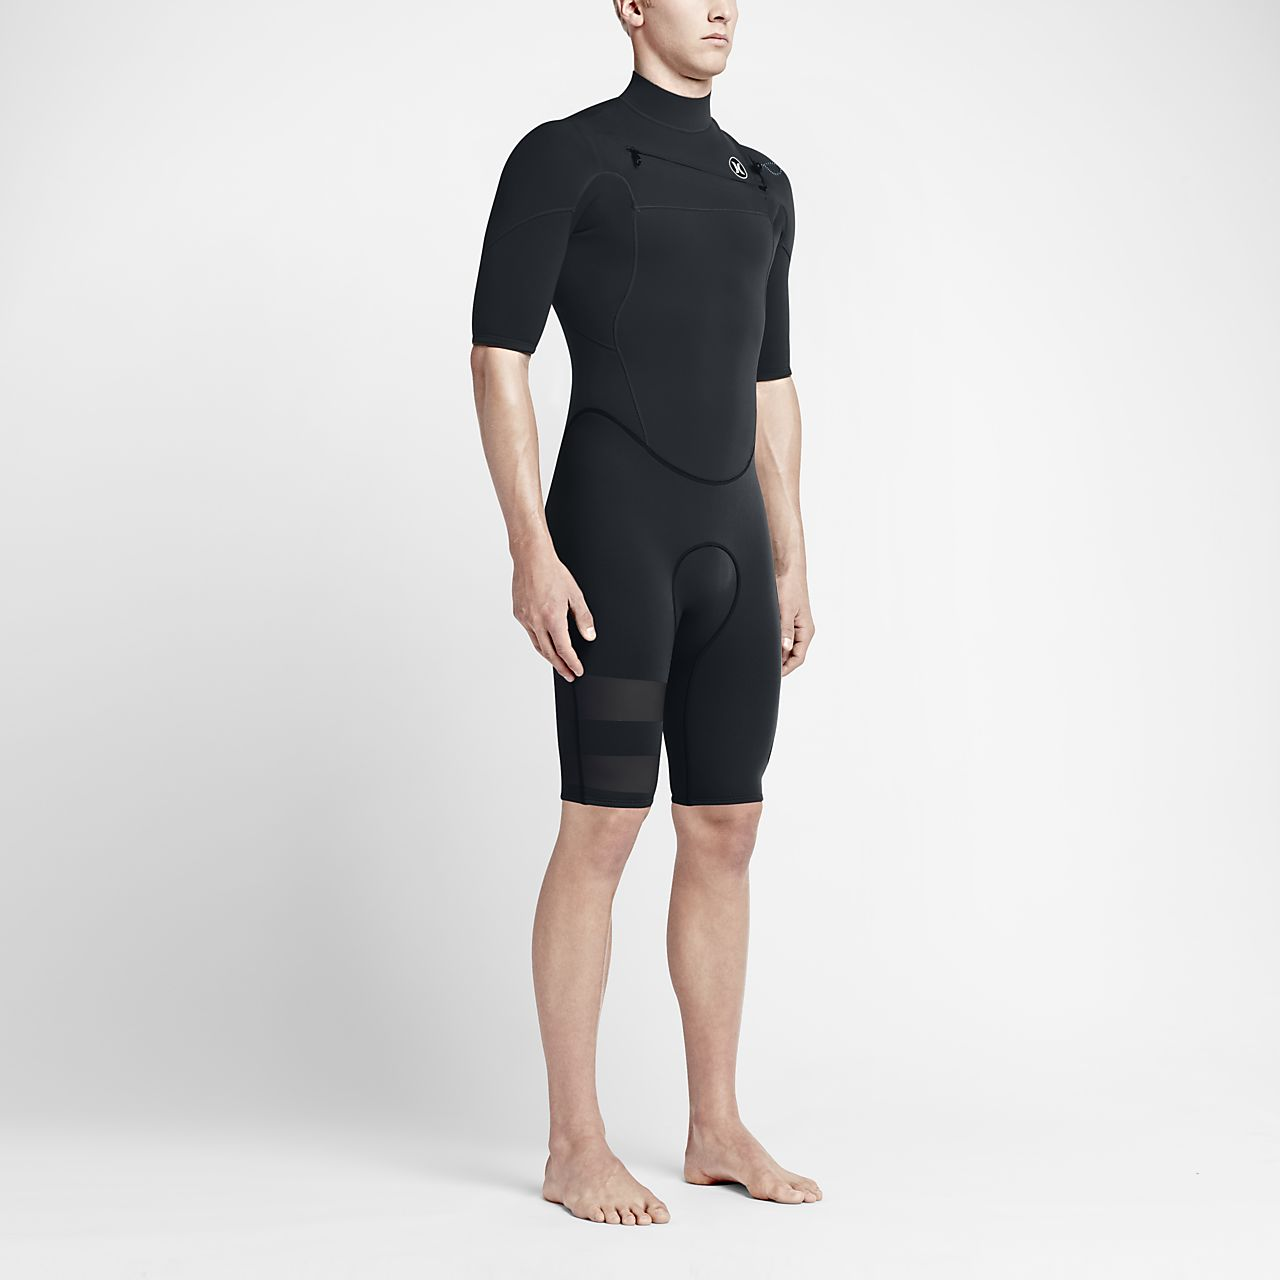 ... Hurley Fusion 202 Short-Sleeve Springsuit Men's Wetsuit